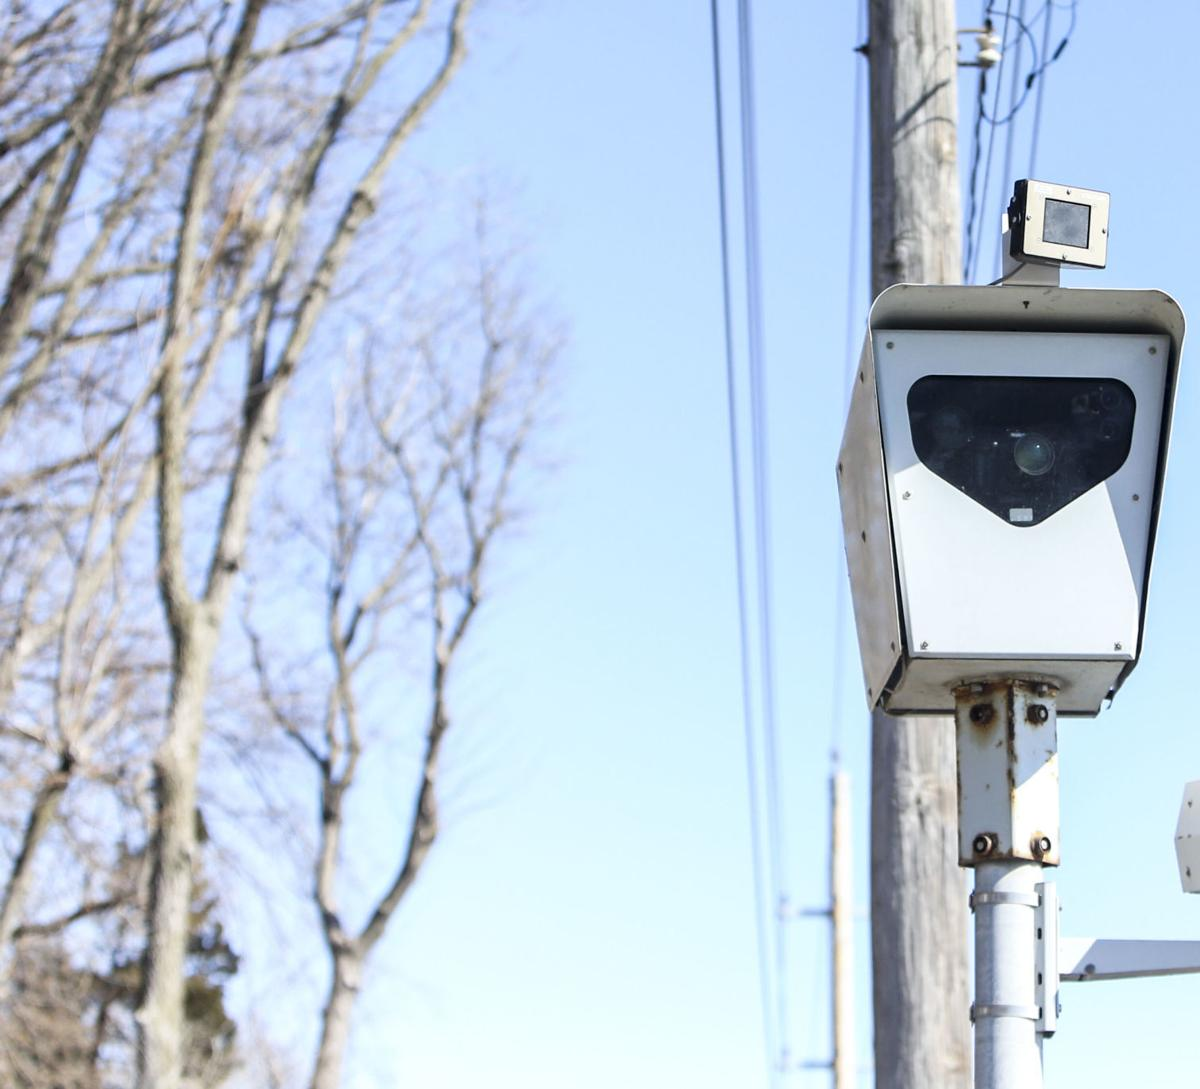 030221-qc-nws-trafficcams-02.JPG